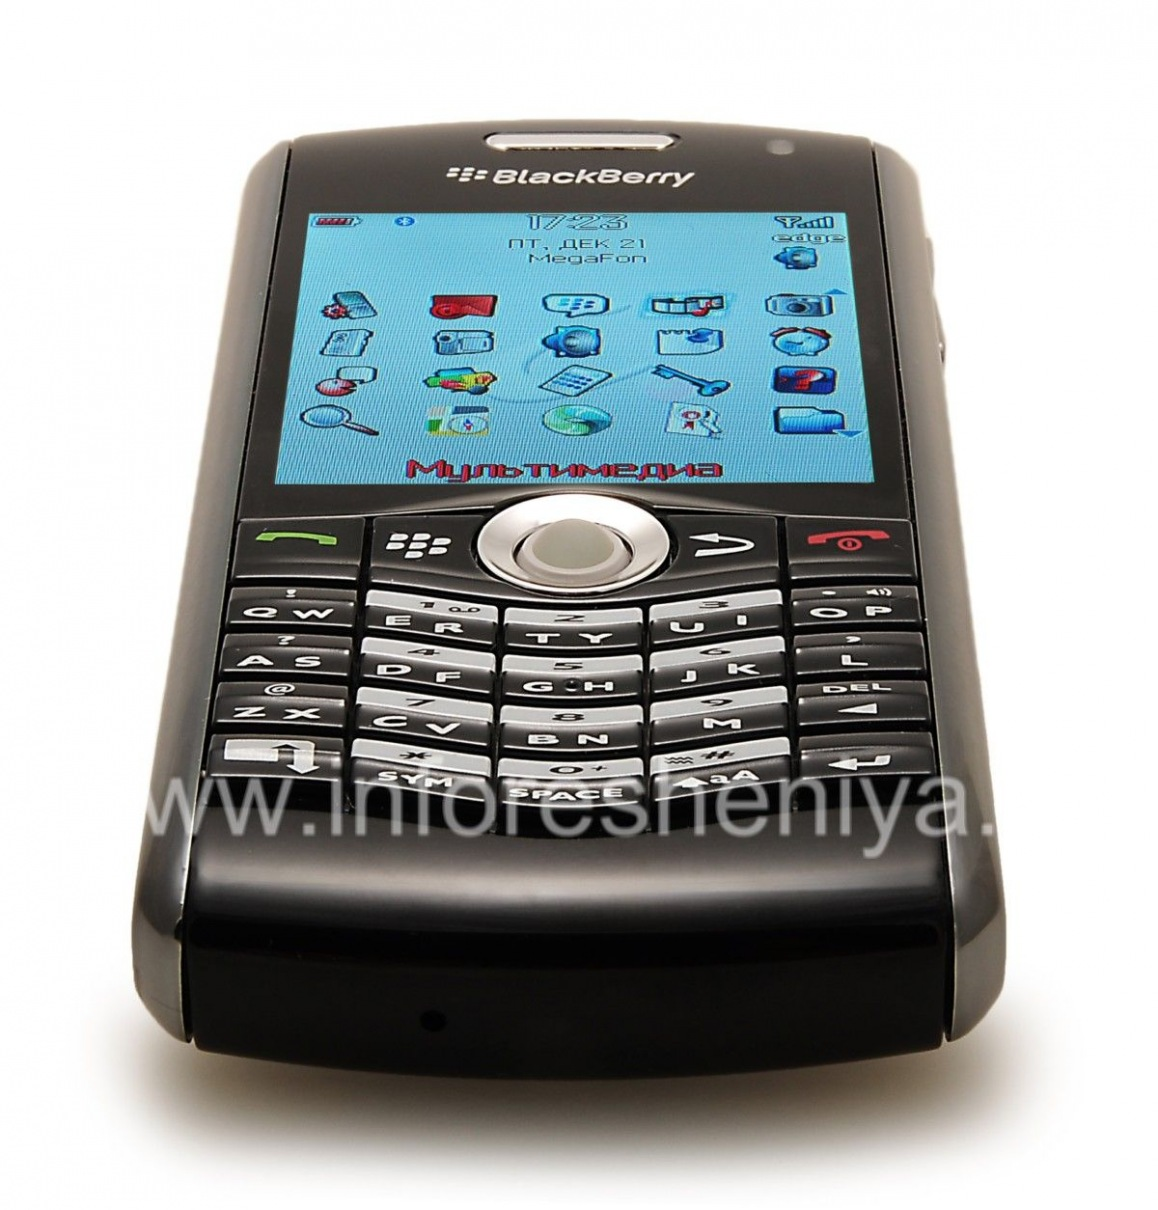 buy smartphone blackberry 8110 pearl black everything for rh inforesheniya ru BlackBerry 9630 Manual BlackBerry Bold Instruction Manual